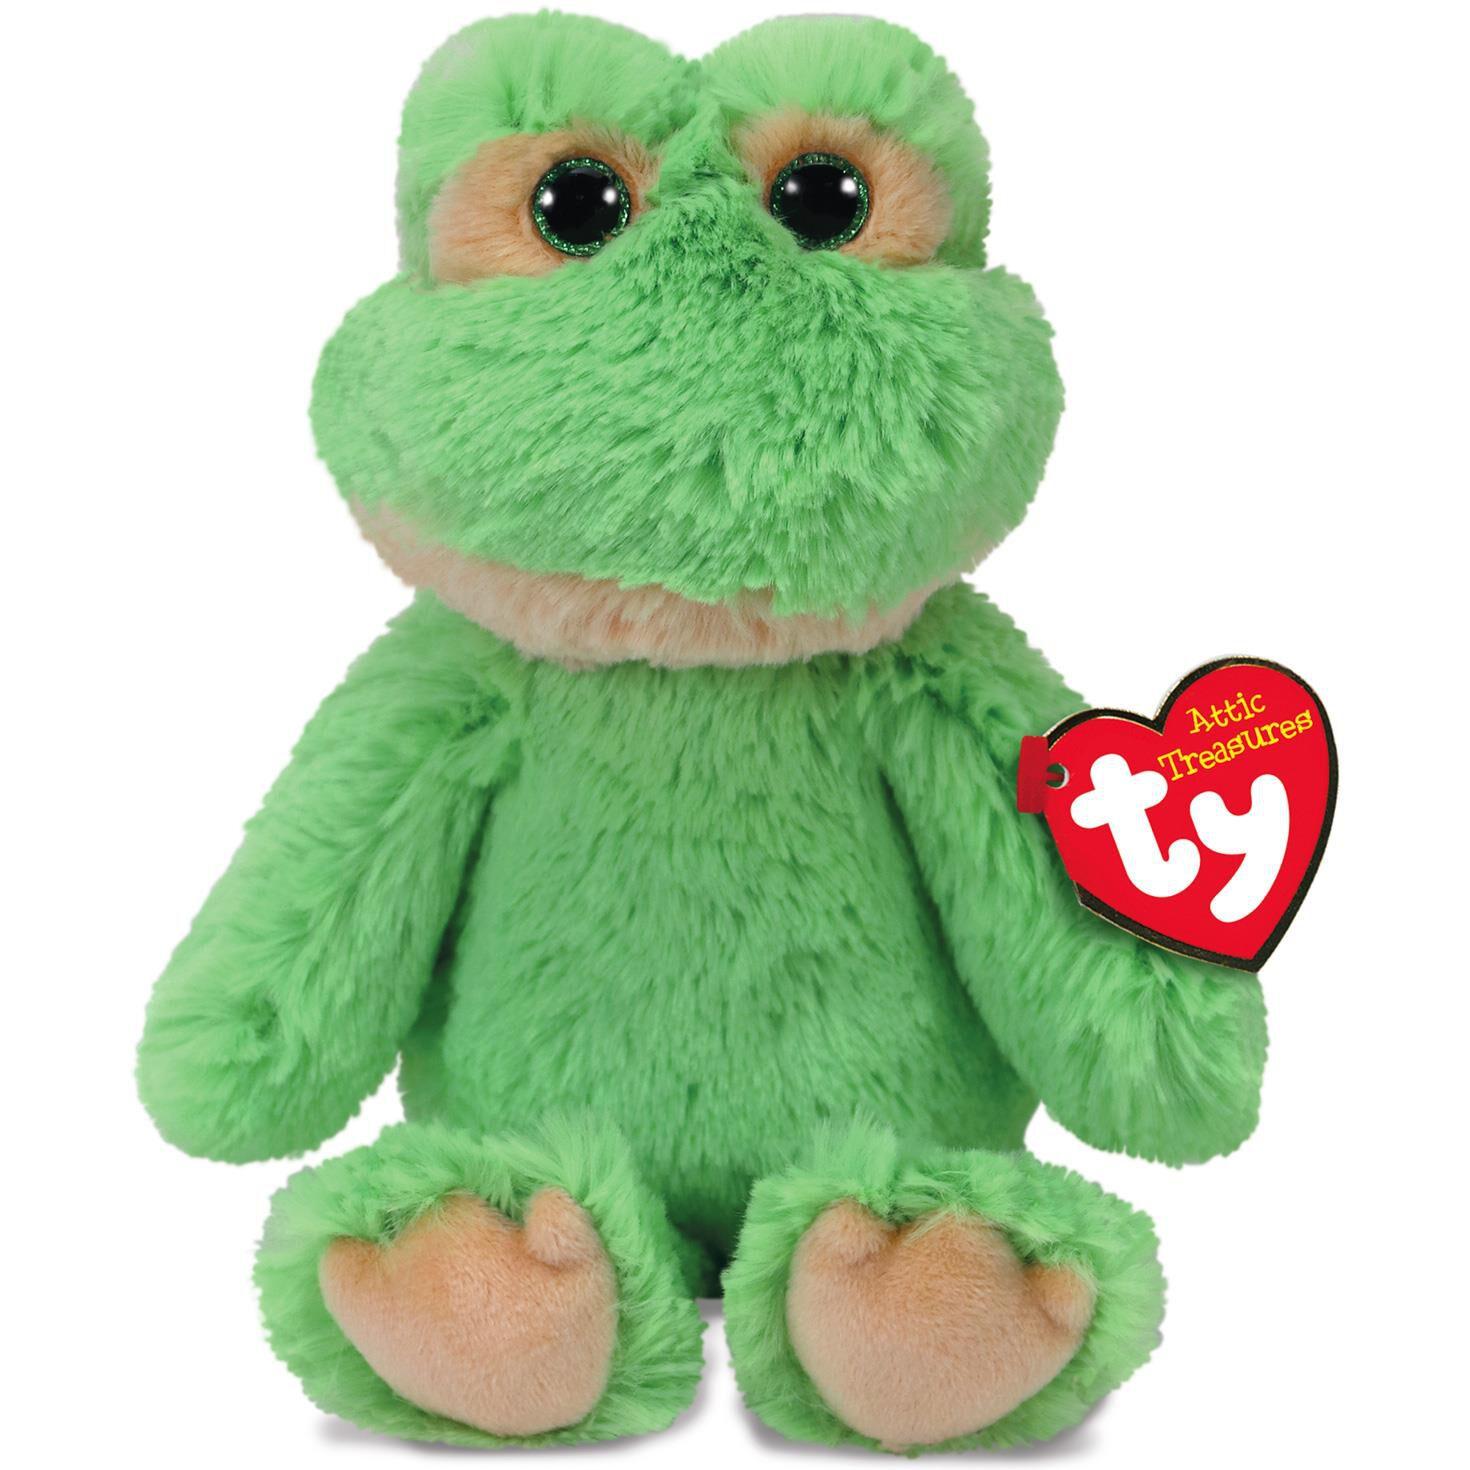 Ty® Attic Treasures Floyd Frog Stuffed Animal 8   sc 1 st  Hallmark & Ty® Attic Treasures Floyd Frog Stuffed Animal 8